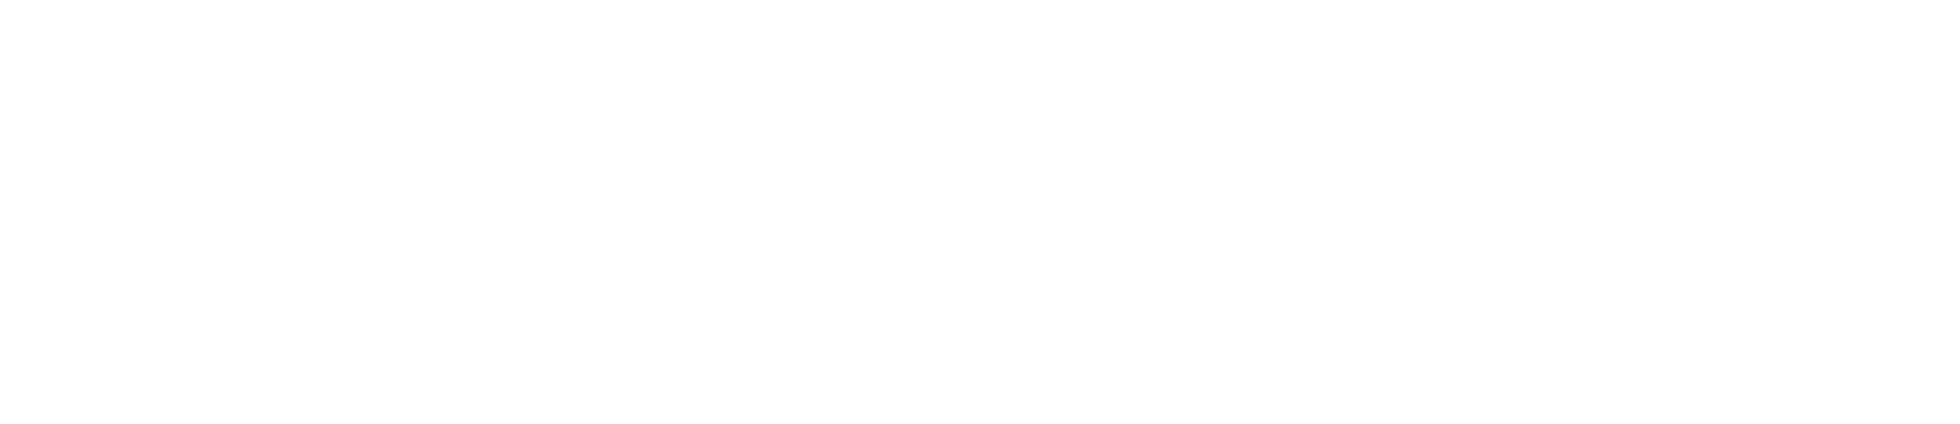 Bifdood logo white - D&G Group.png